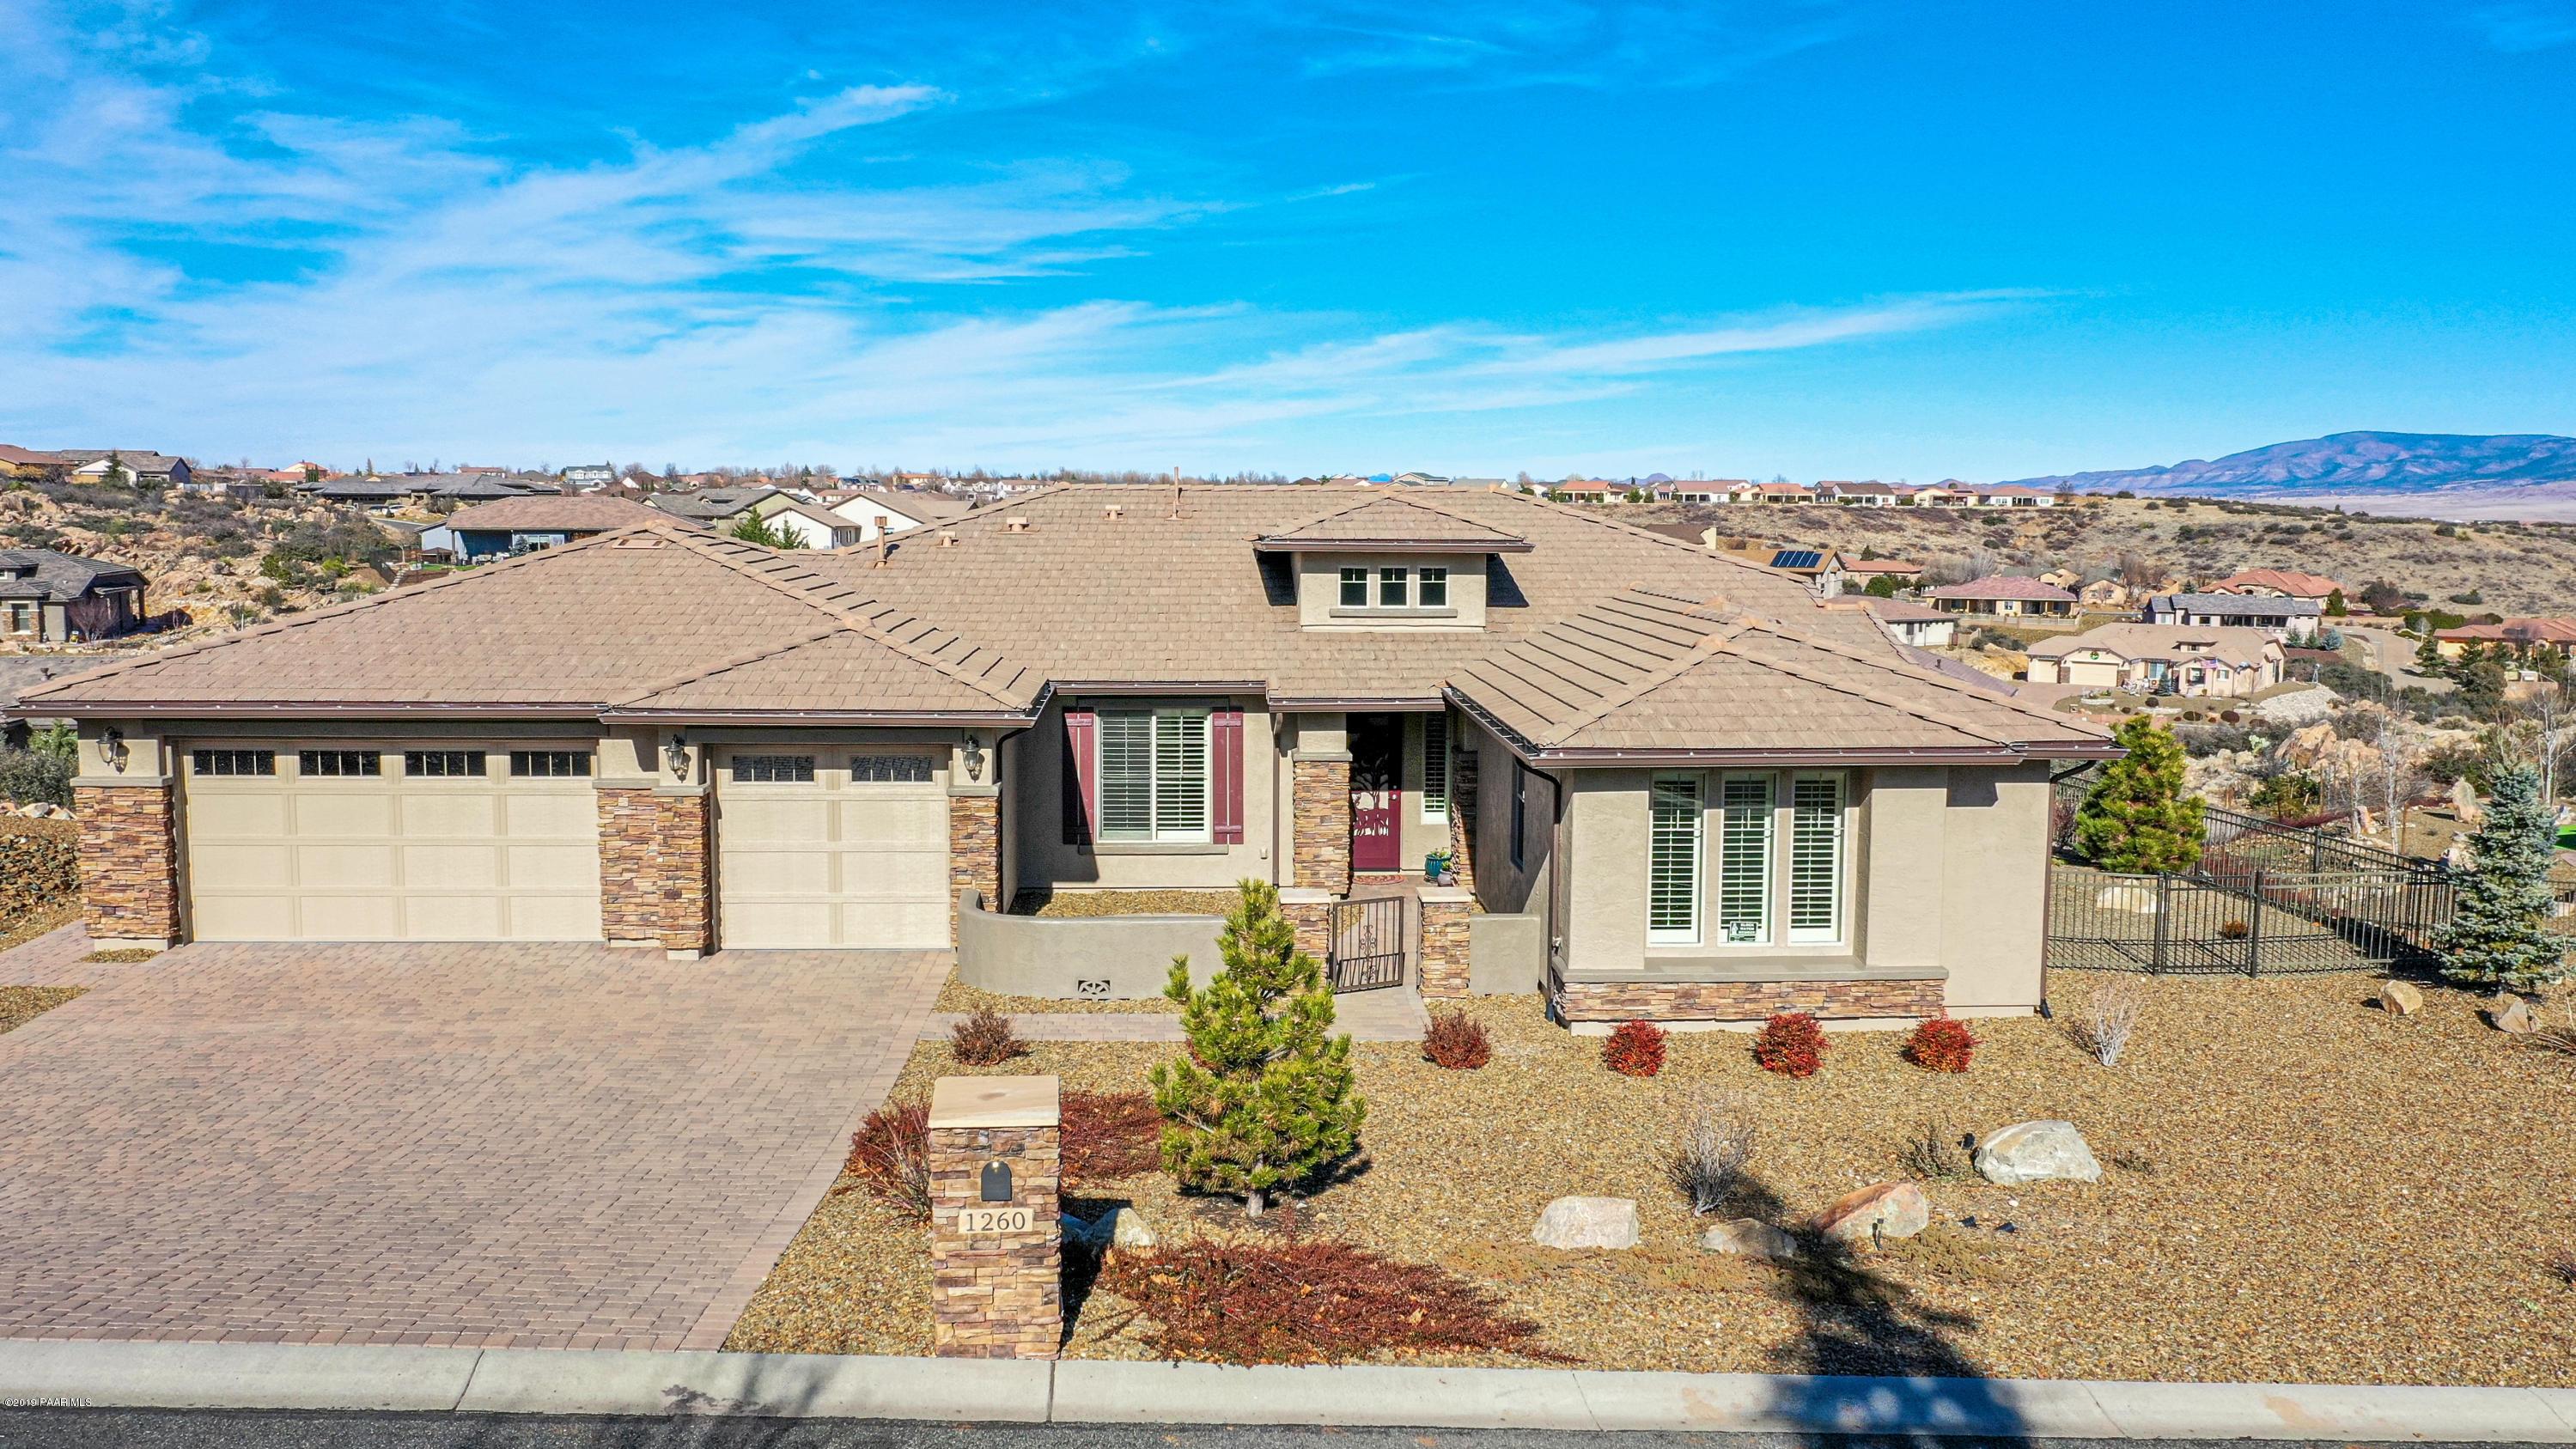 Photo of 1260 Wide Open, Prescott Valley, AZ 86314